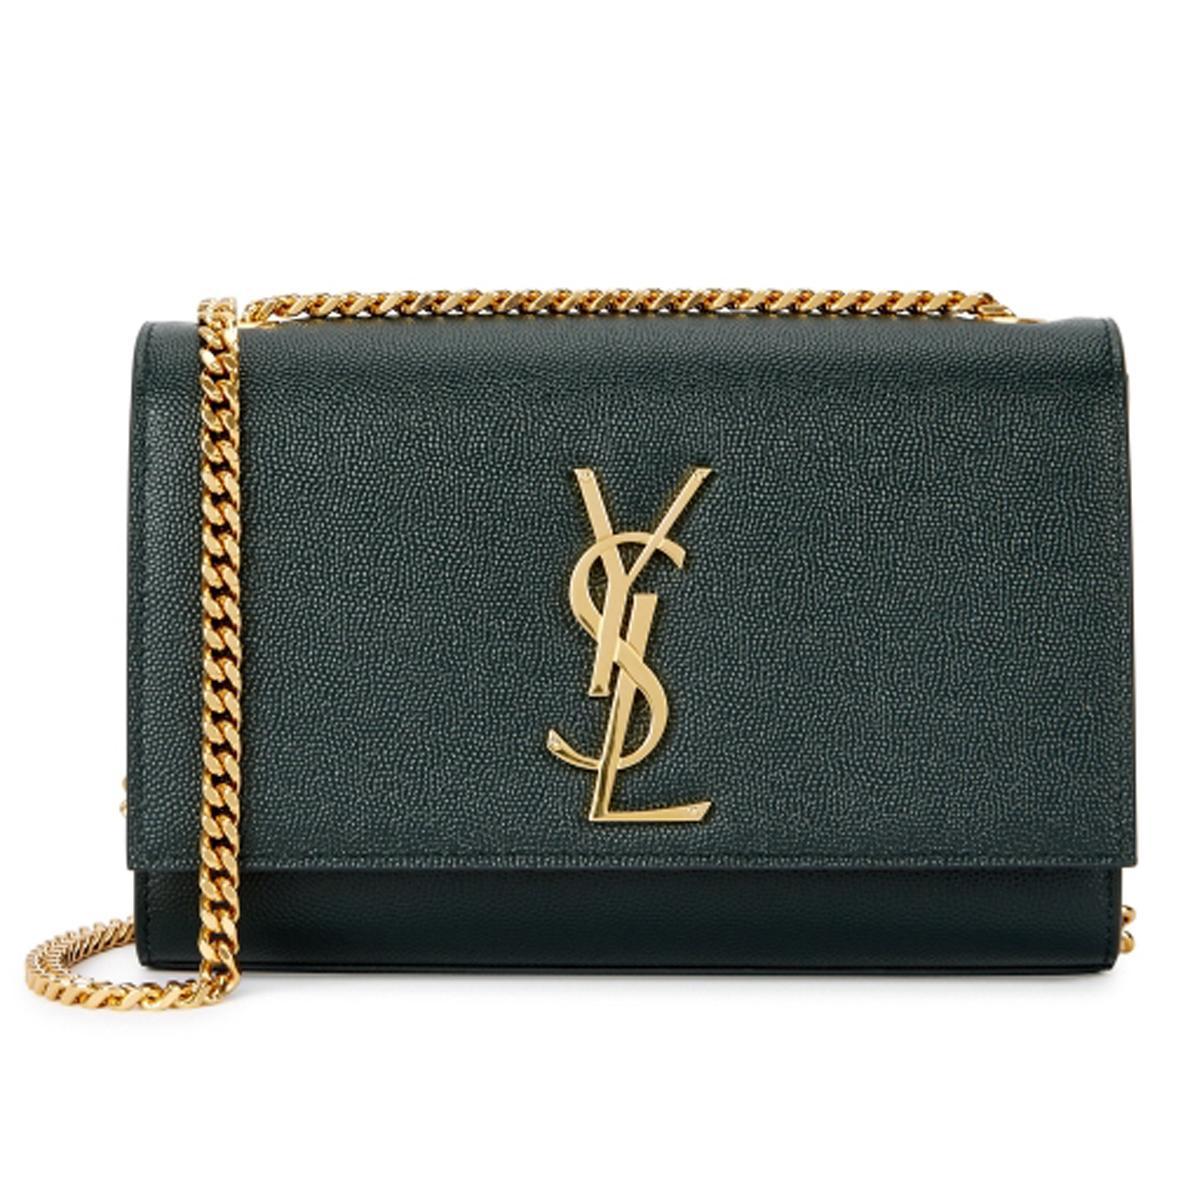 classic-designer-handbag-brands-271996-1541601800967-product.1200x0c.jpg (1200×1200)